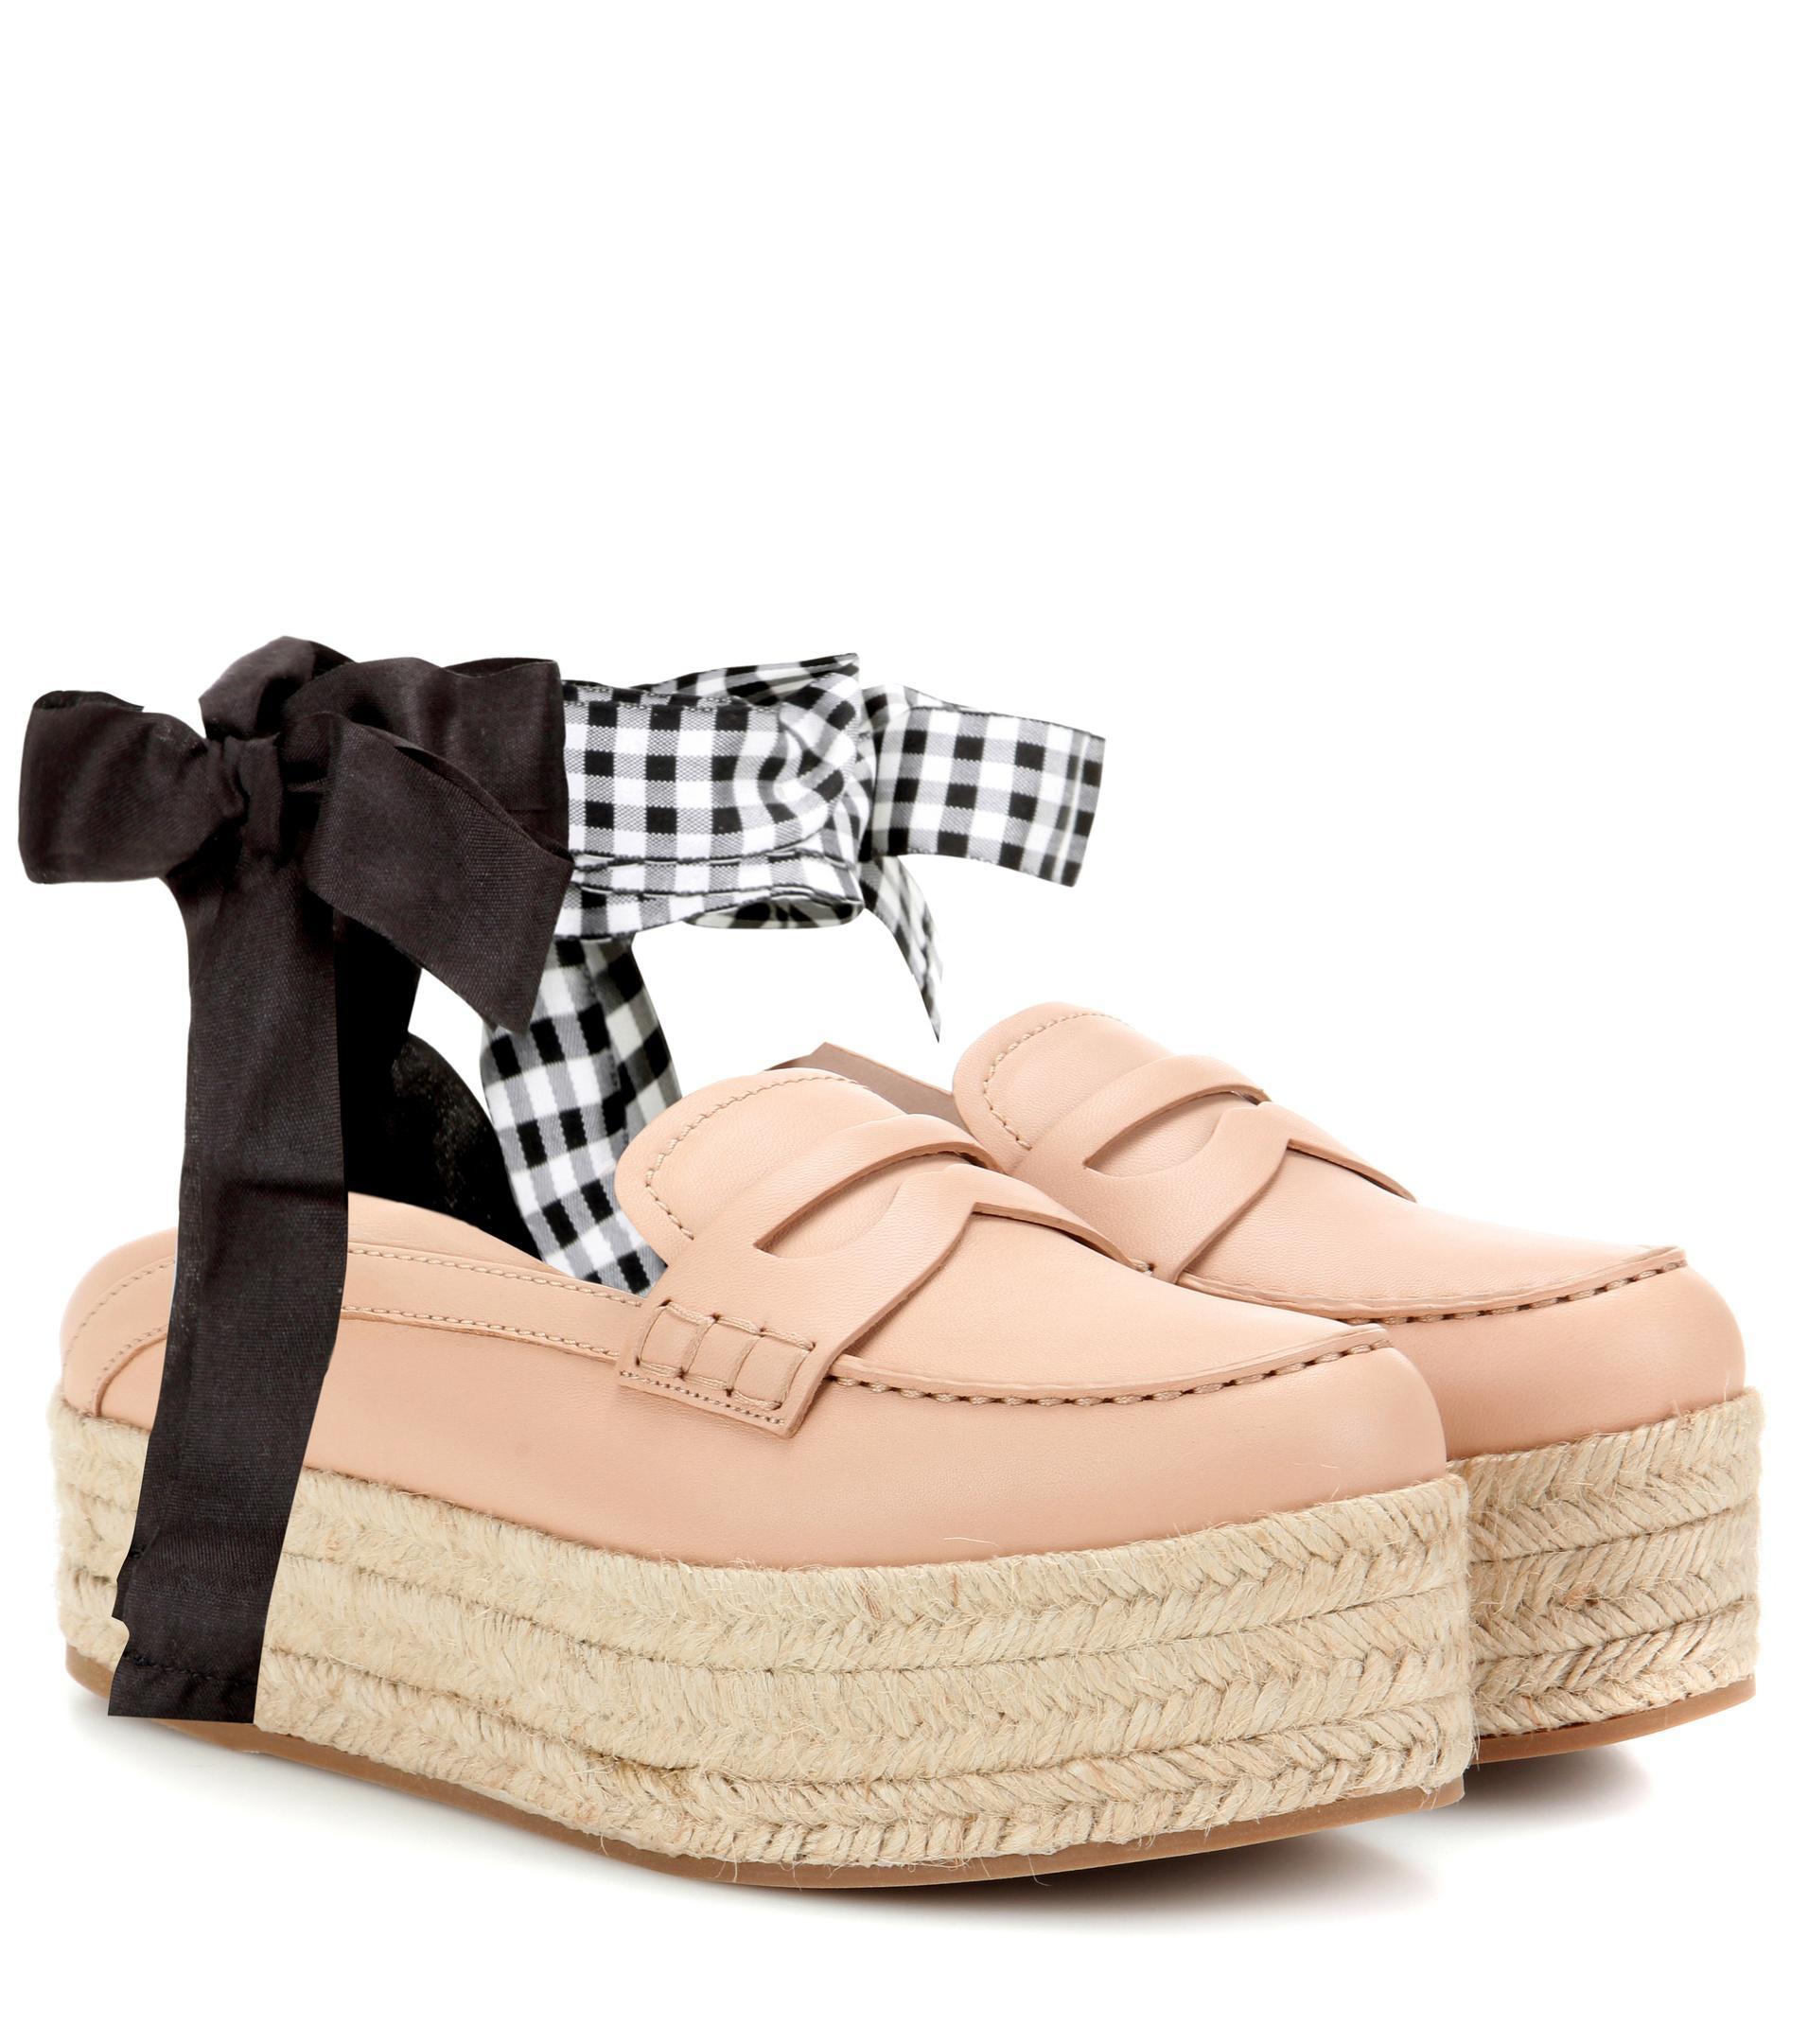 Miu Miu Leather platform loafers k8TDfqtXb